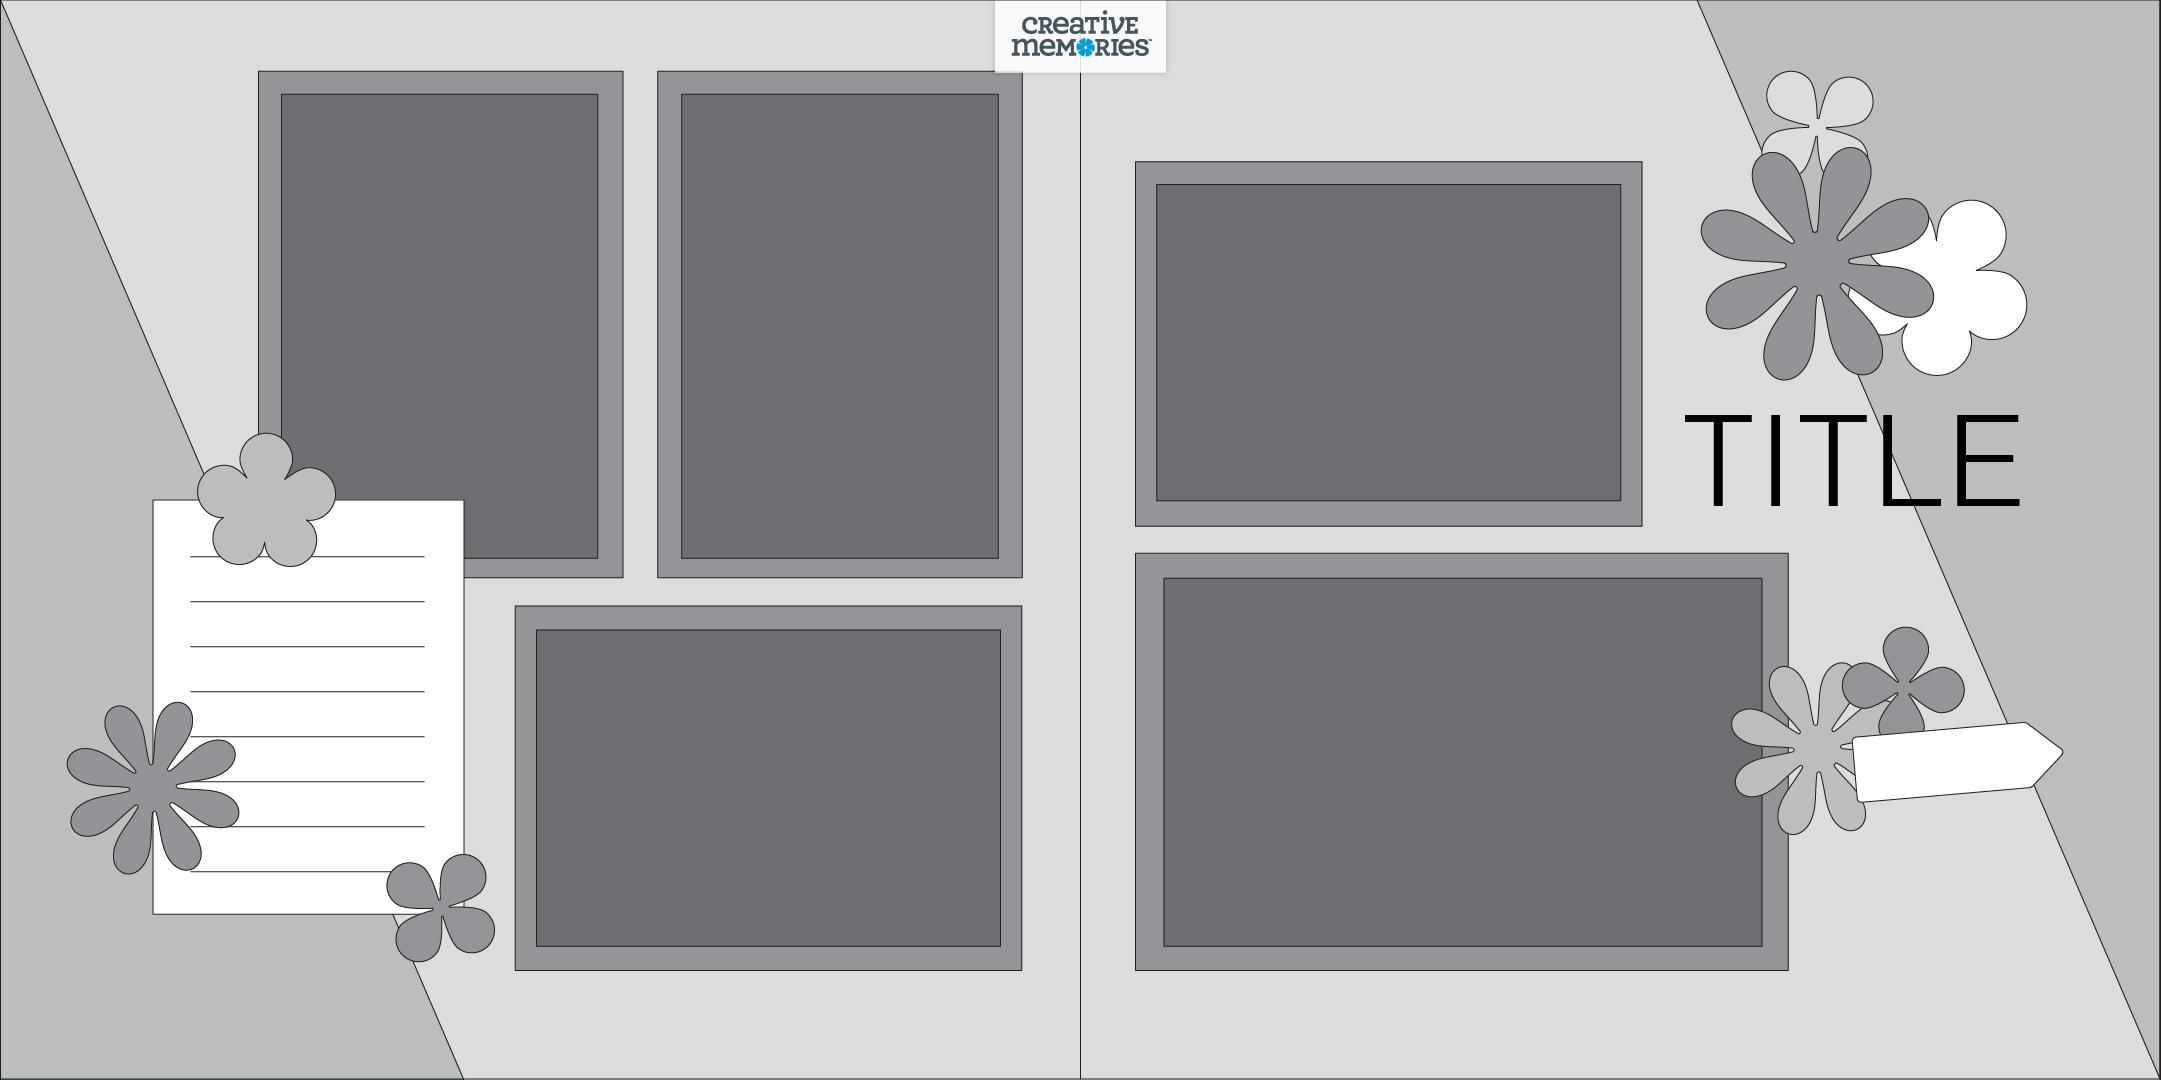 Virtual-Crop-October-Scrapbook-Sketch5-Creative-Memories (1).jpg